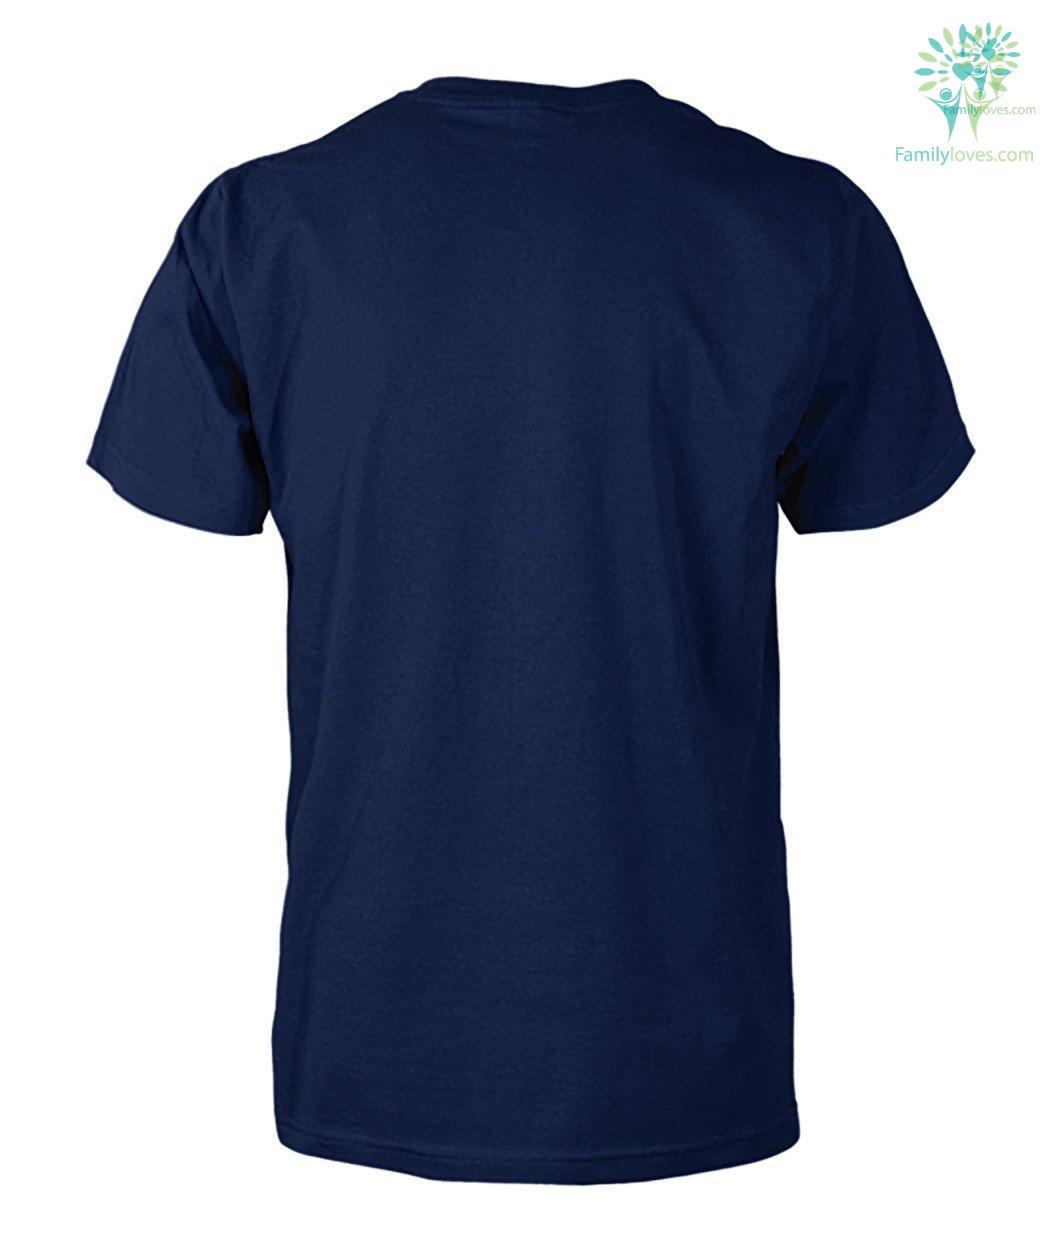 Buy ROYAL MARINES VETERAN - Familyloves hoodies t-shirt jacket mug cheapest free shipping 50% off